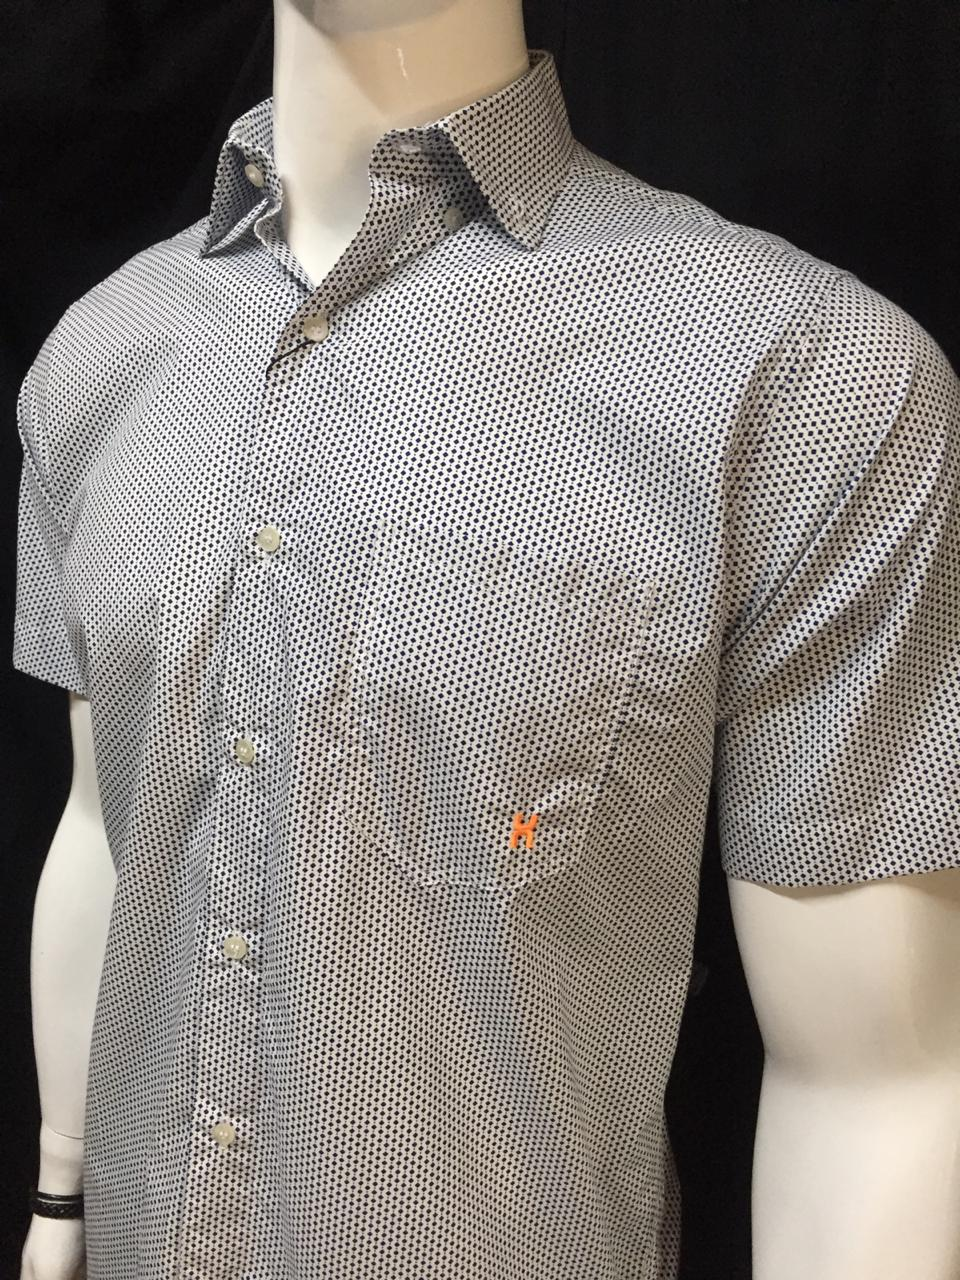 Camisa Manga Curta Txc